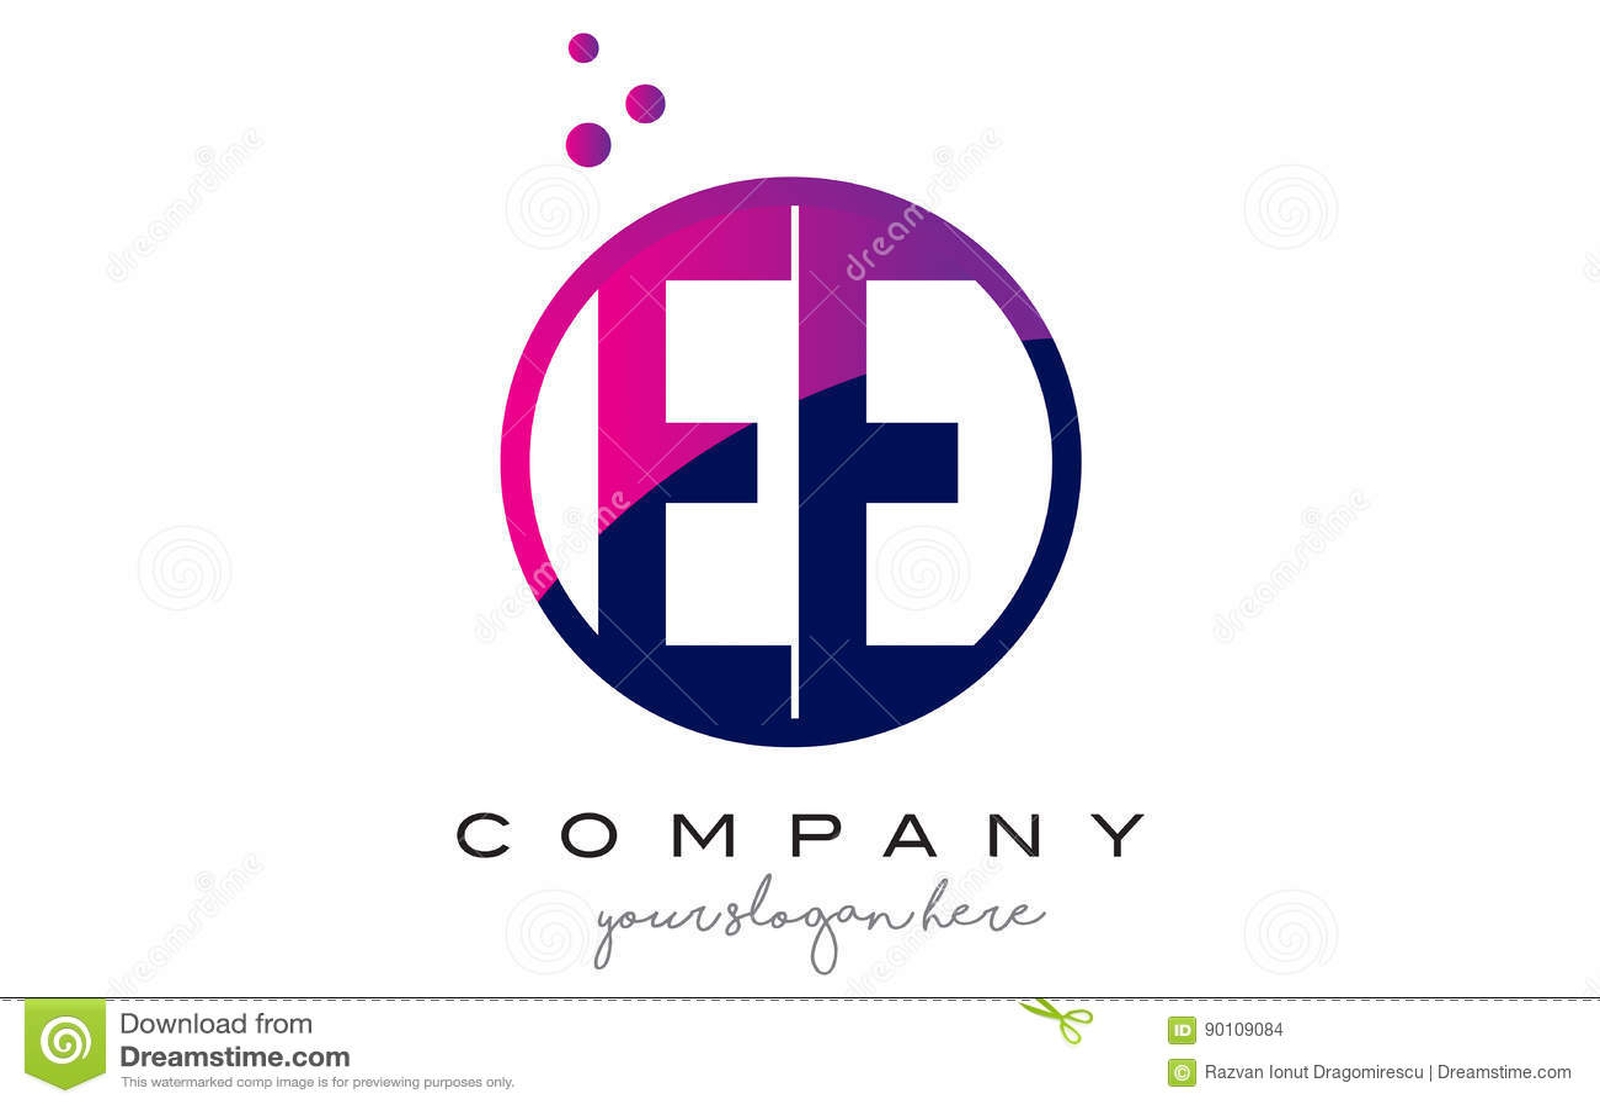 EE E E Circle Letter Logo Design With Purple Dots Bubbles Stock ...